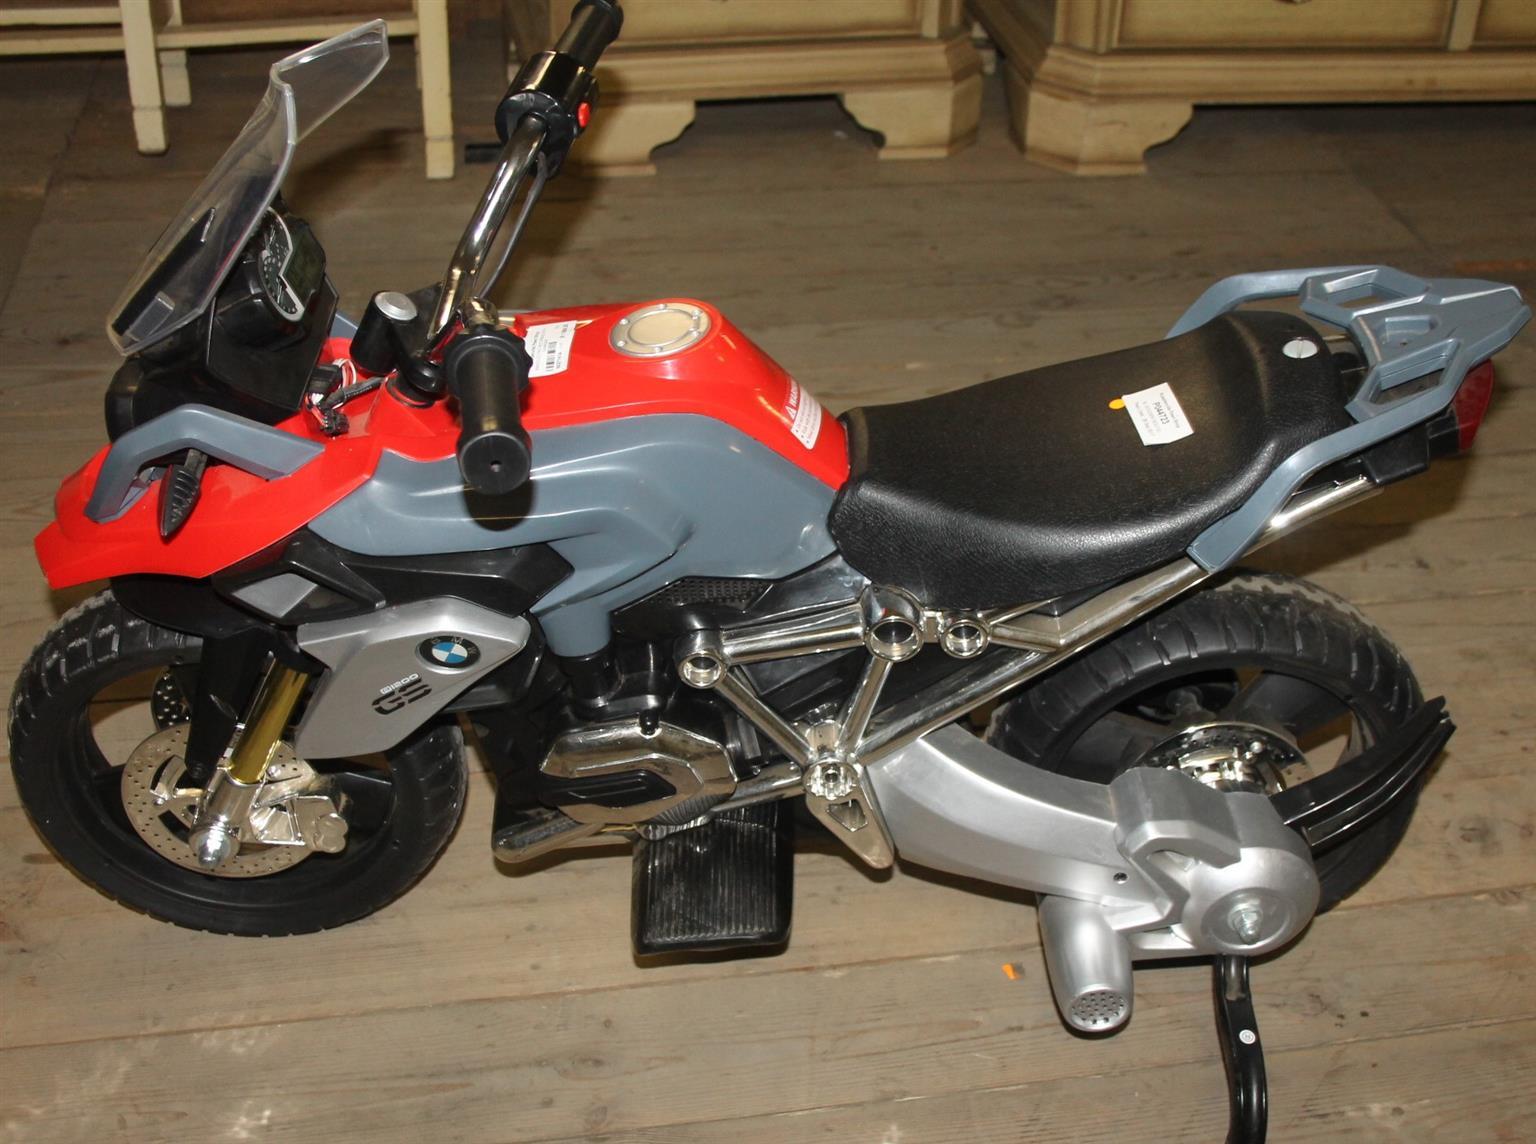 BMW  motorbike S027141a #Rosettenvillepawnshop